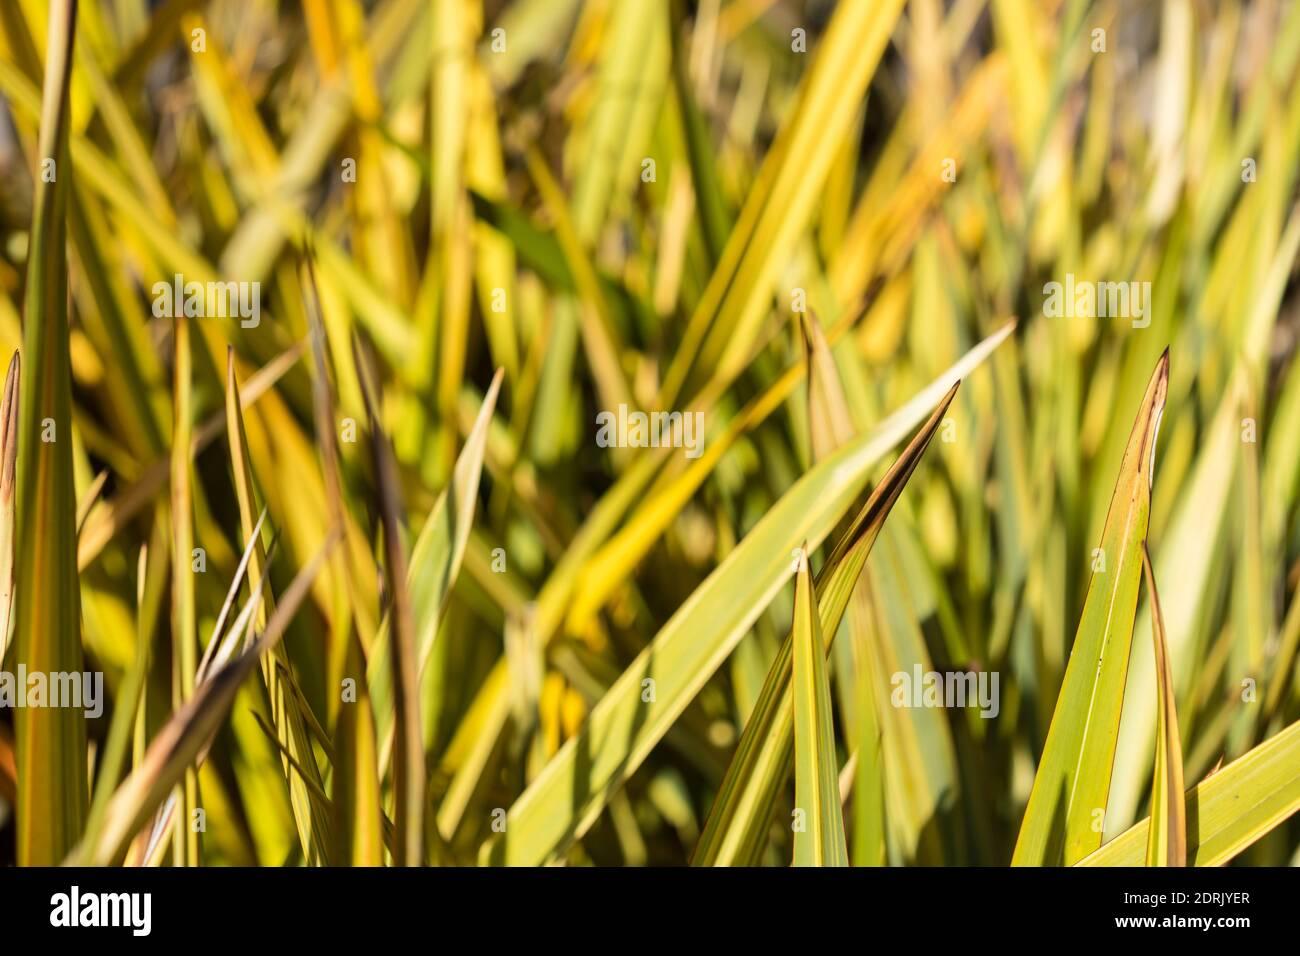 Flachs Blätter phormium Agavaceae tanax, Neuseeland Stockfoto